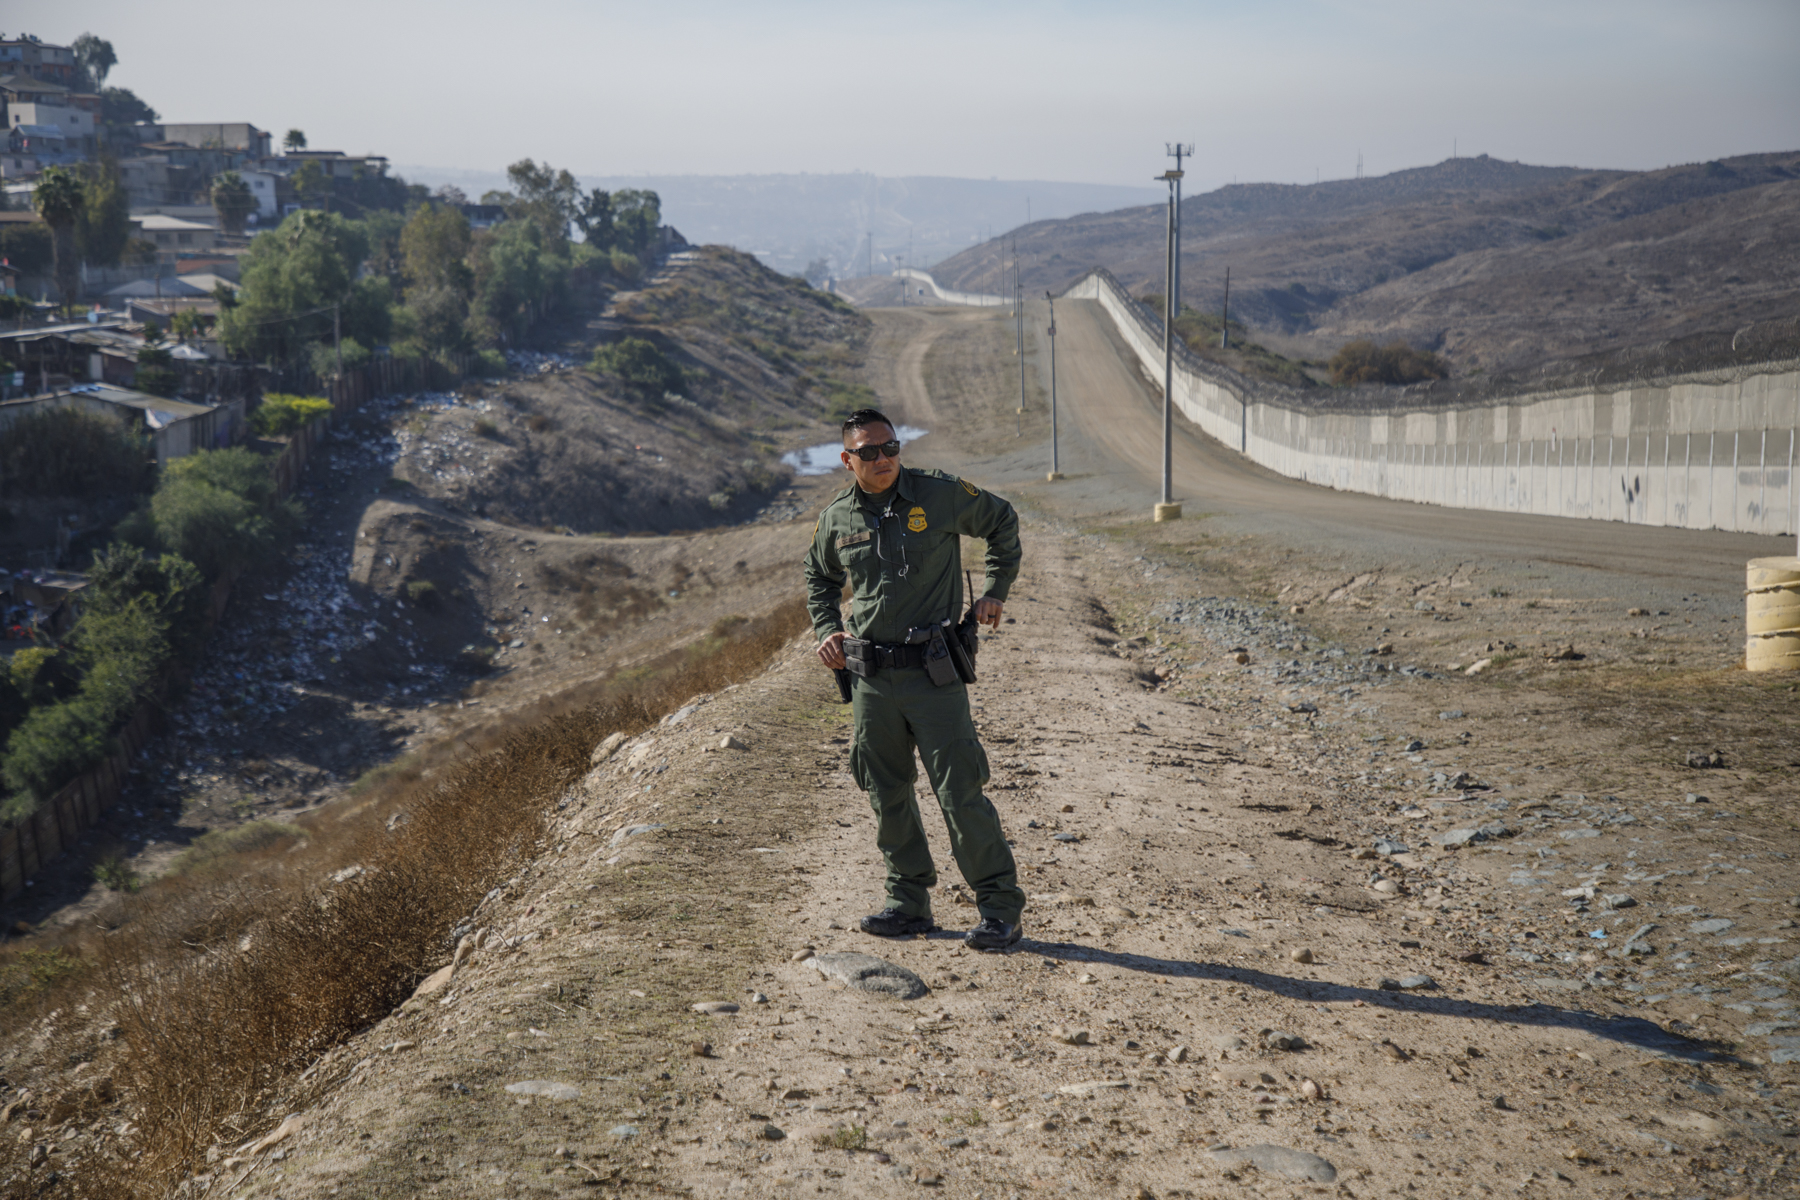 us-mex-border-aug2020-22